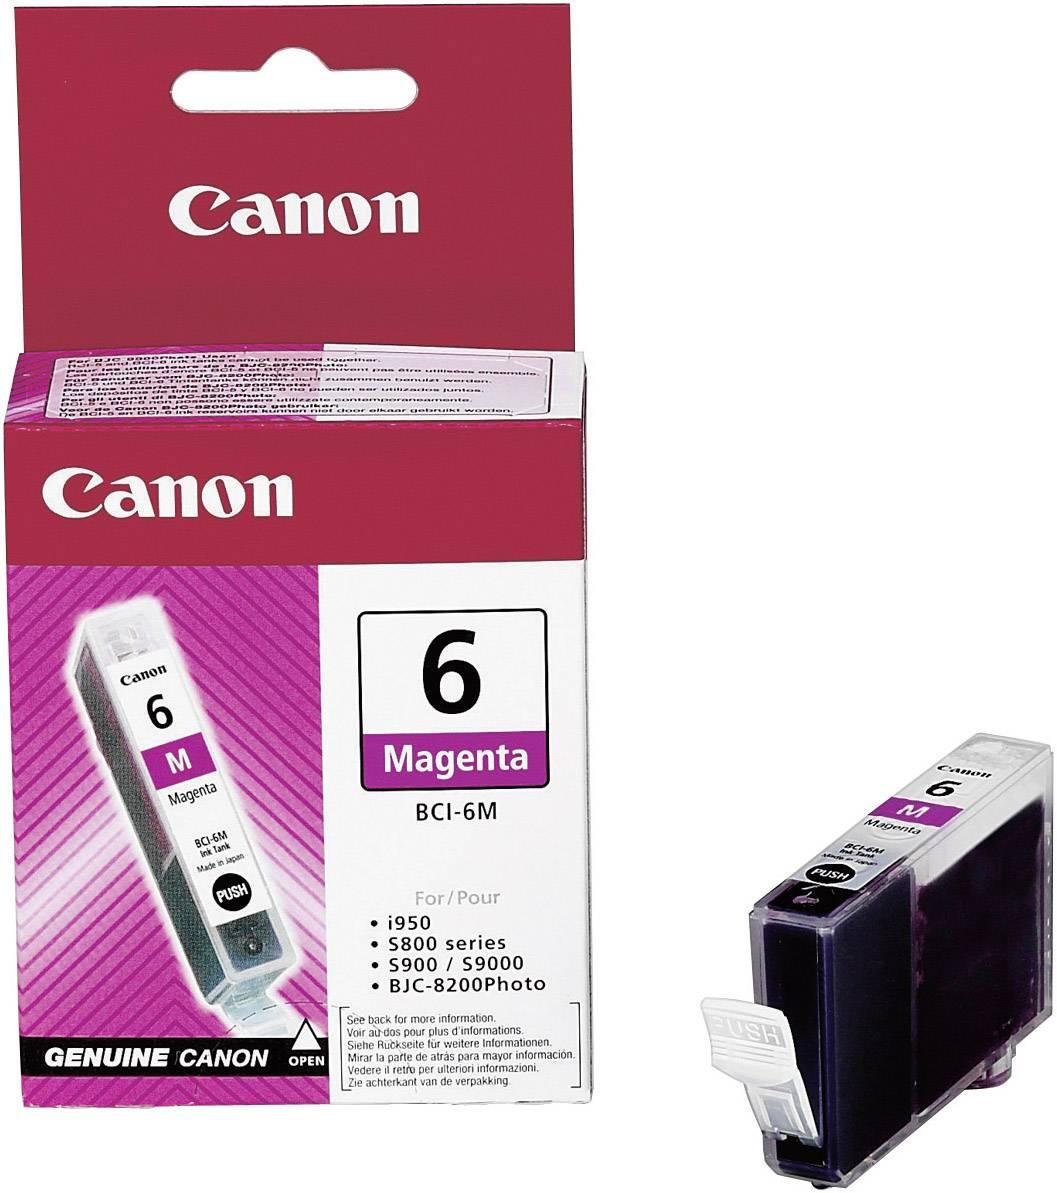 BCI-6Y-4708A002 CARTUCCIA ORIGINALE CANON I865